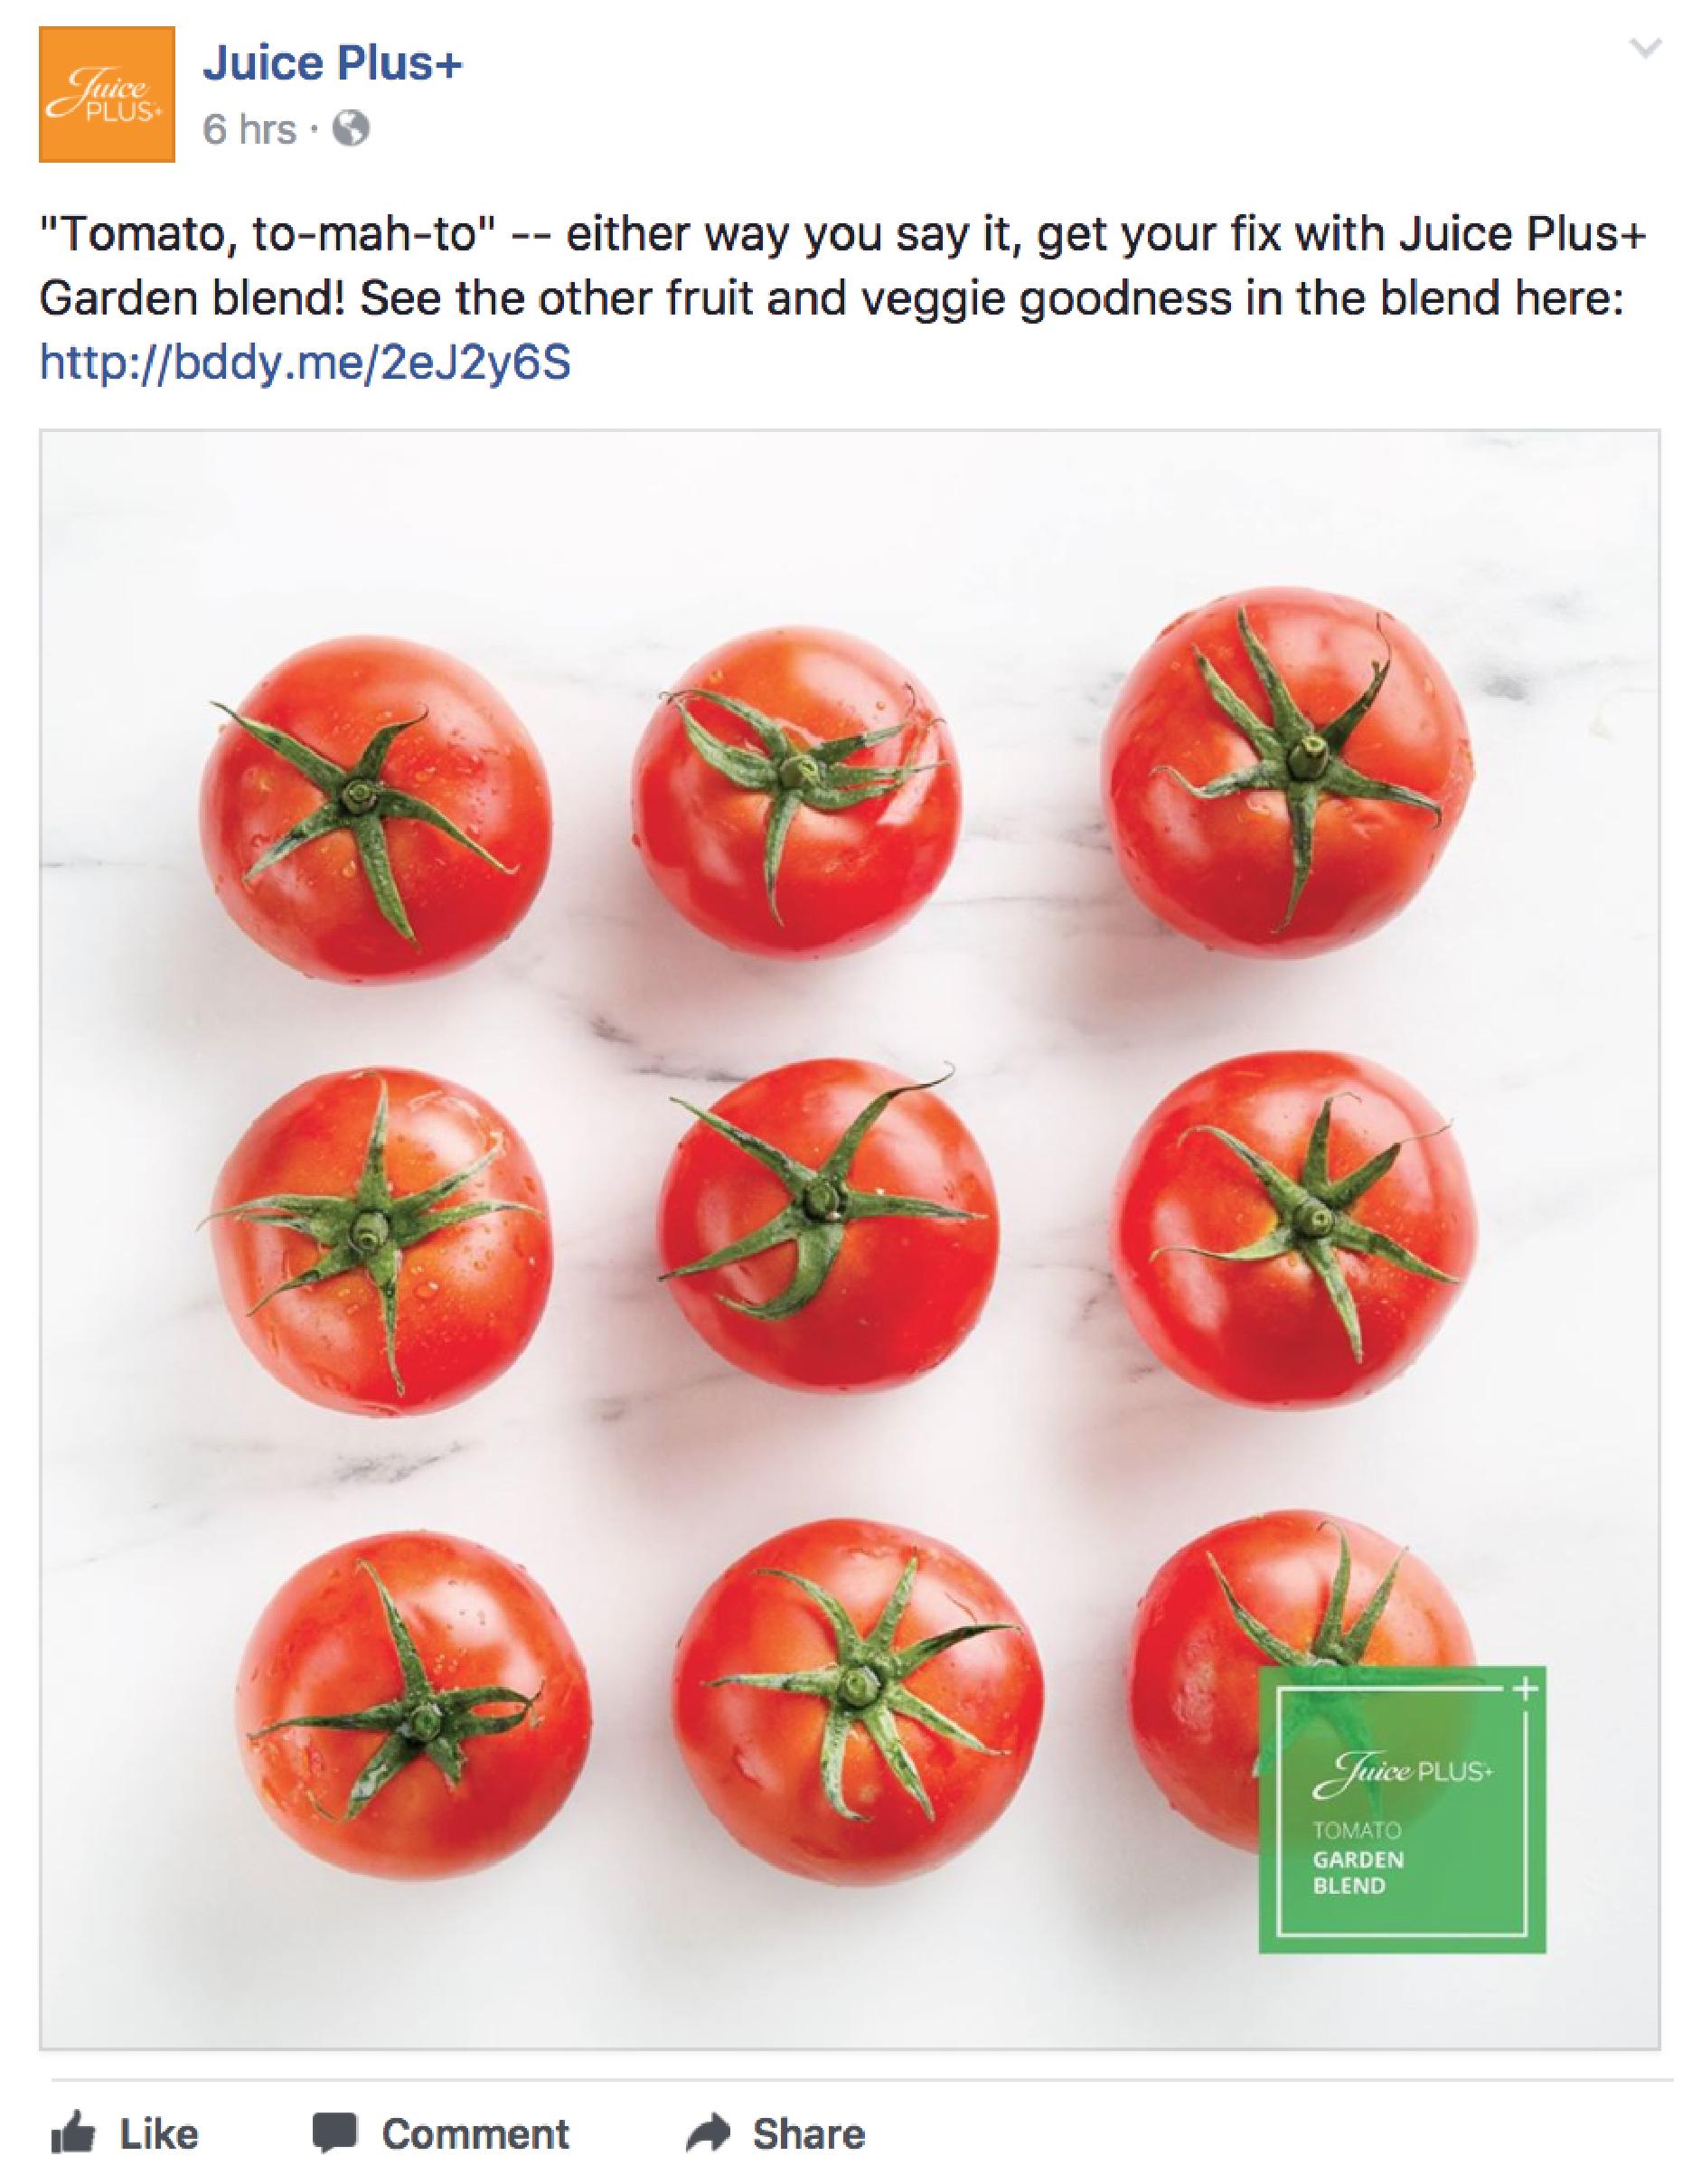 Juice Plus+ Tomatoes